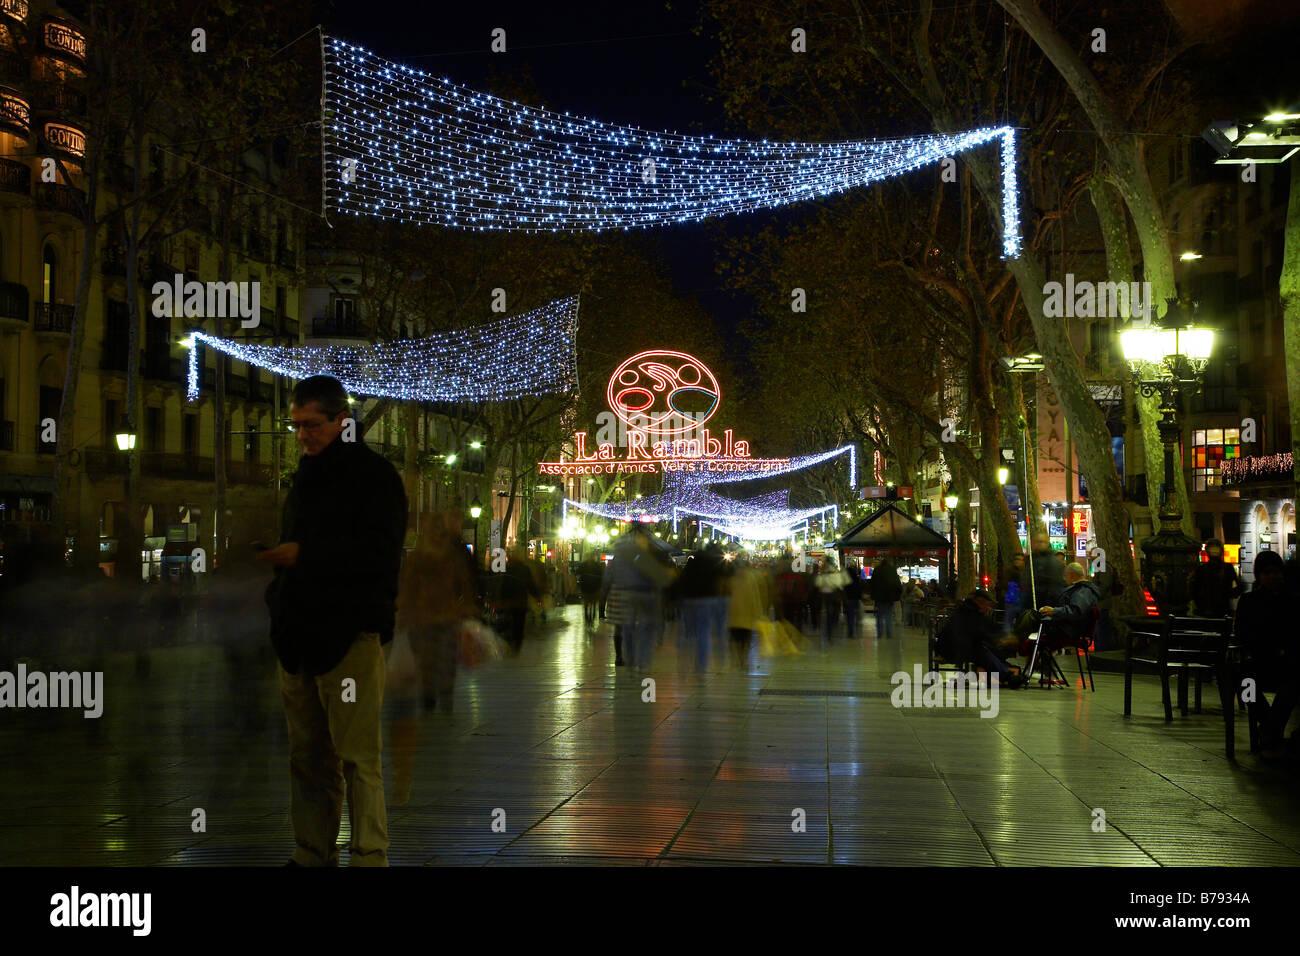 Christmas Lights At La Rambla High Street In Barcelona Stock Photo  - Christmas Lights In La